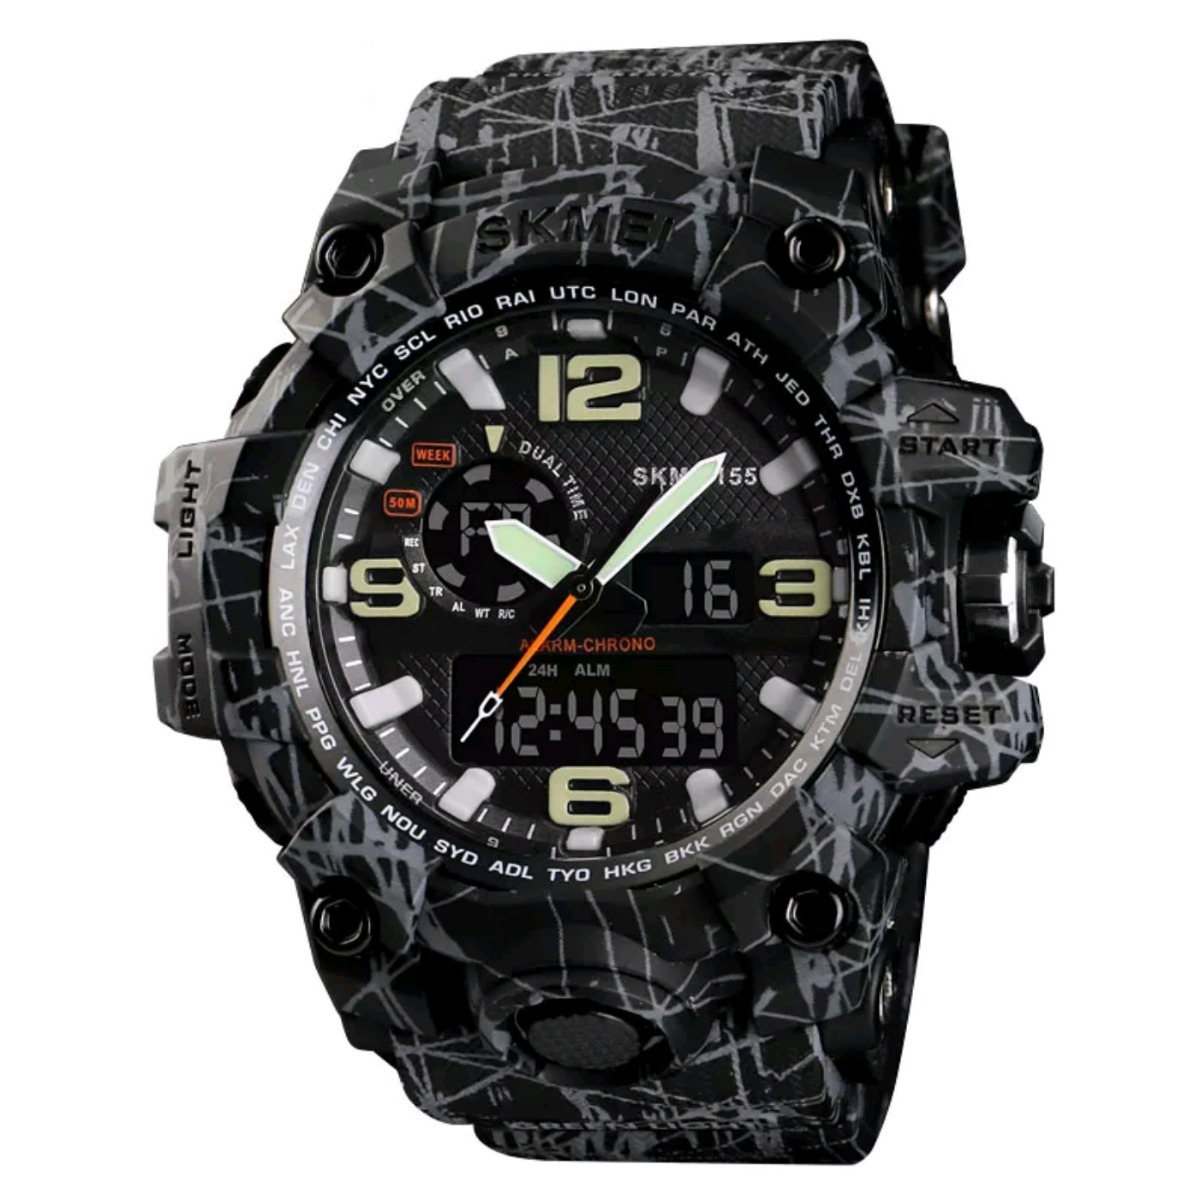 8d15c520833 Relógio Skmei 1155 Esportivo Estilo G-shock 5atm Novas Cores - R  78 ...